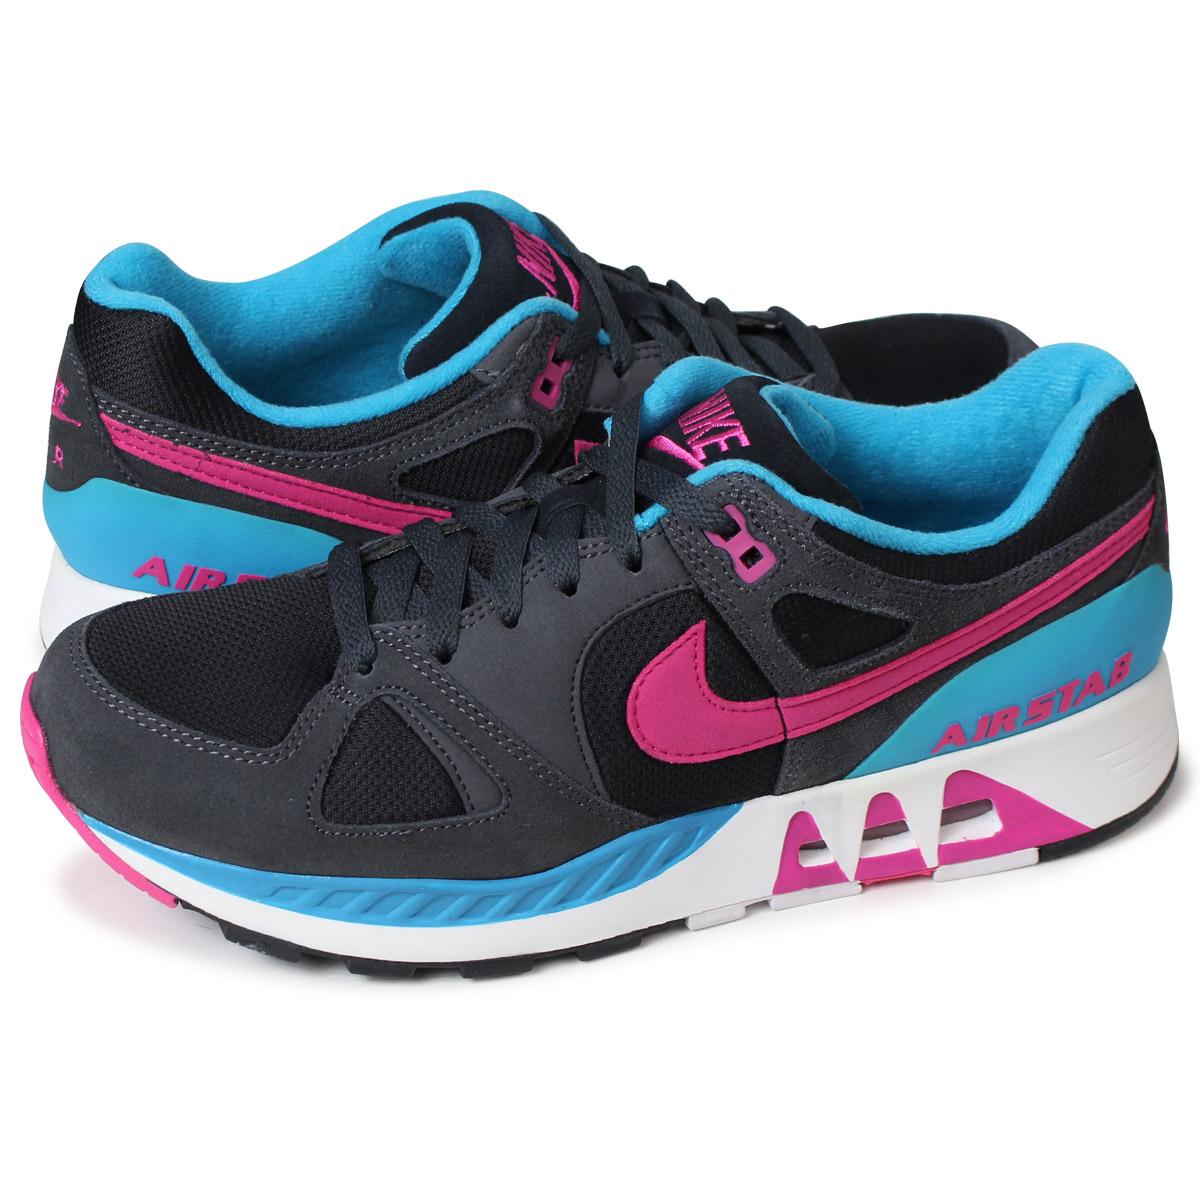 c5d02af27949e Nike NIKE air stub sneakers men AIR STAB 312,451-004 black